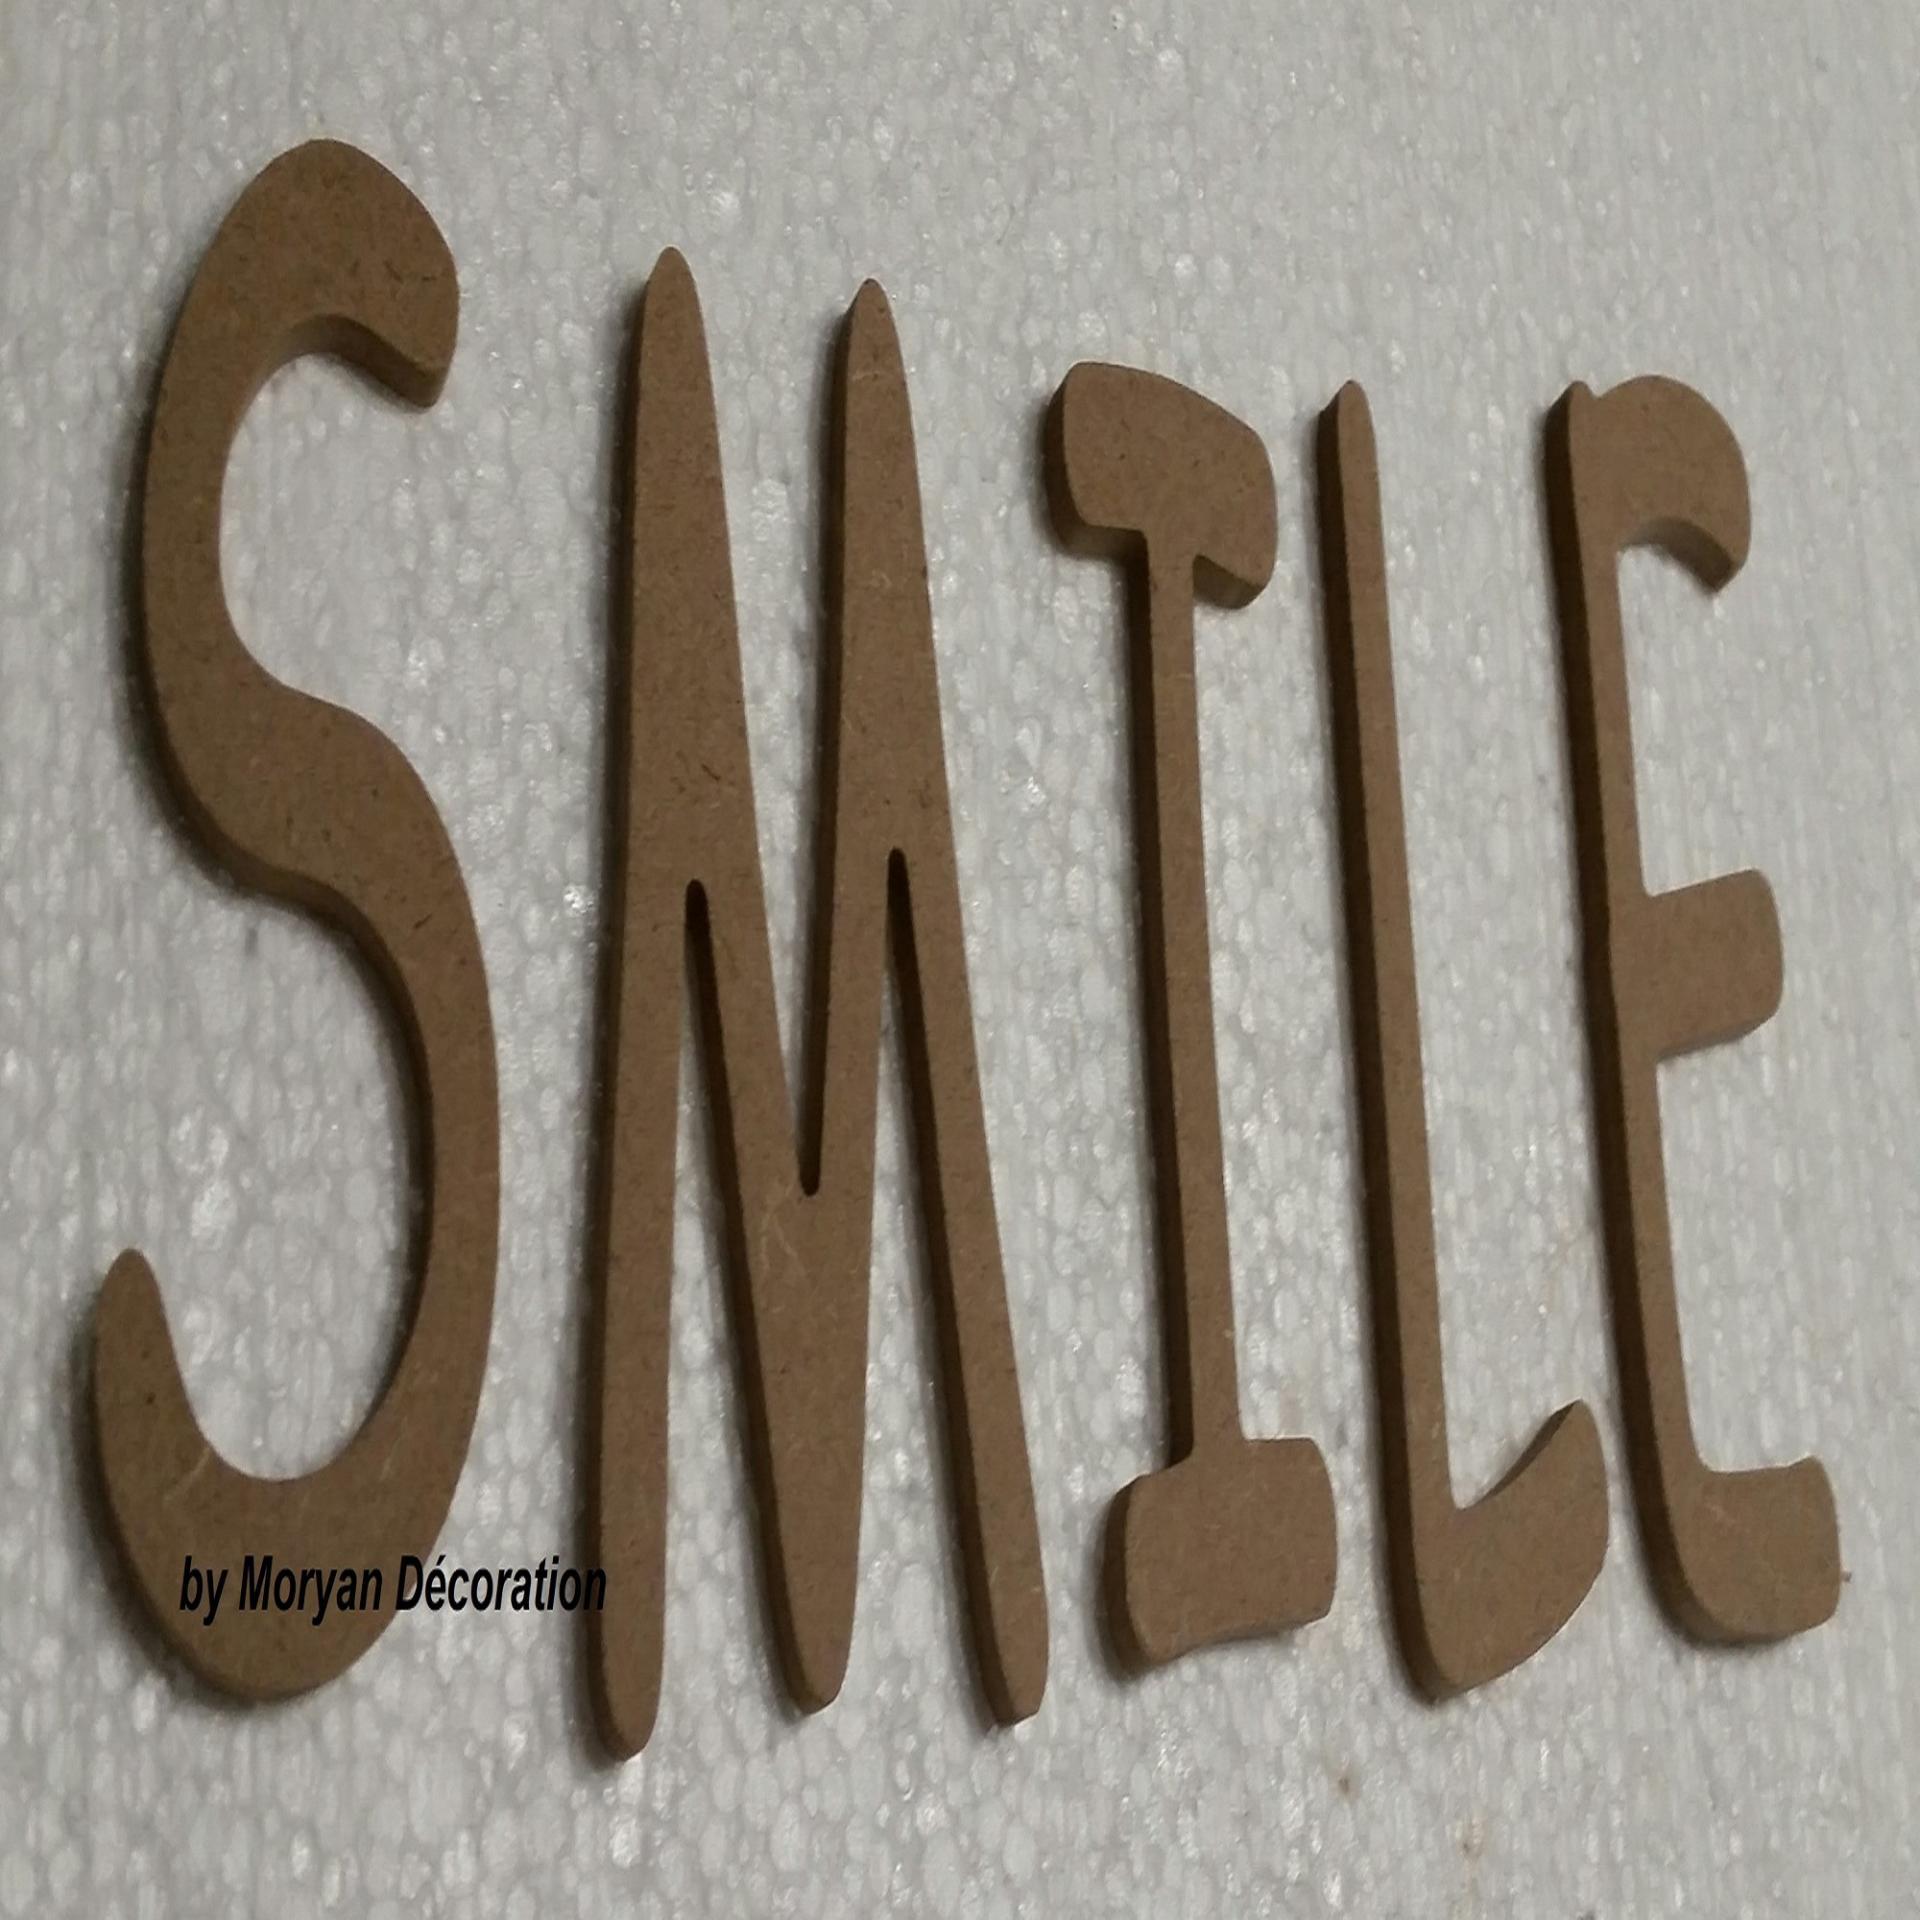 Lettre deco smile 20 cm